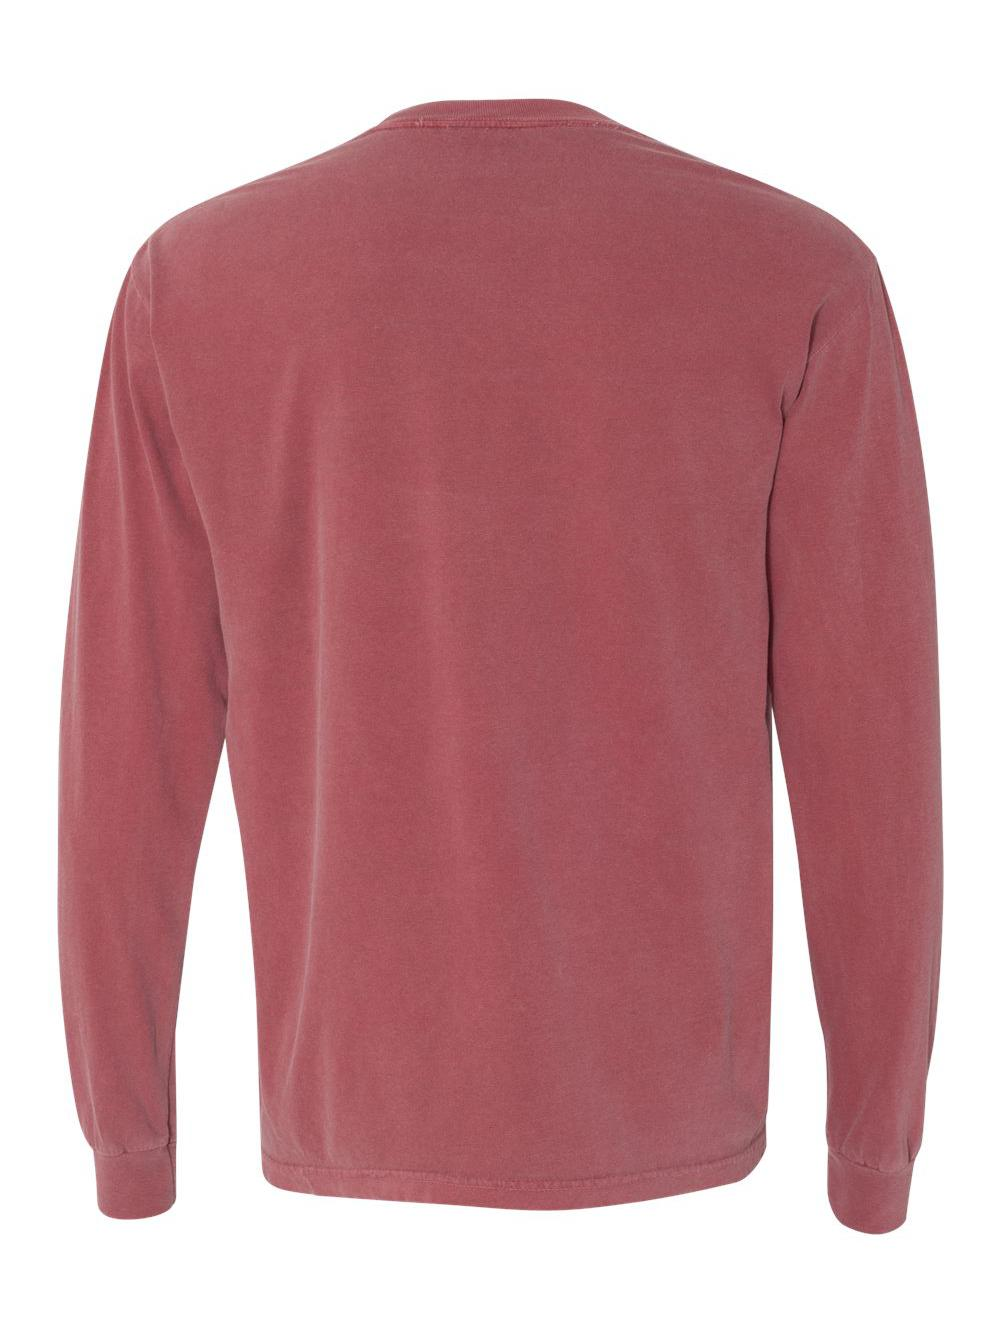 Comfort-Colors-Garment-Dyed-Heavyweight-Ringspun-Long-Sleeve-T-Shirt-6014 thumbnail 16